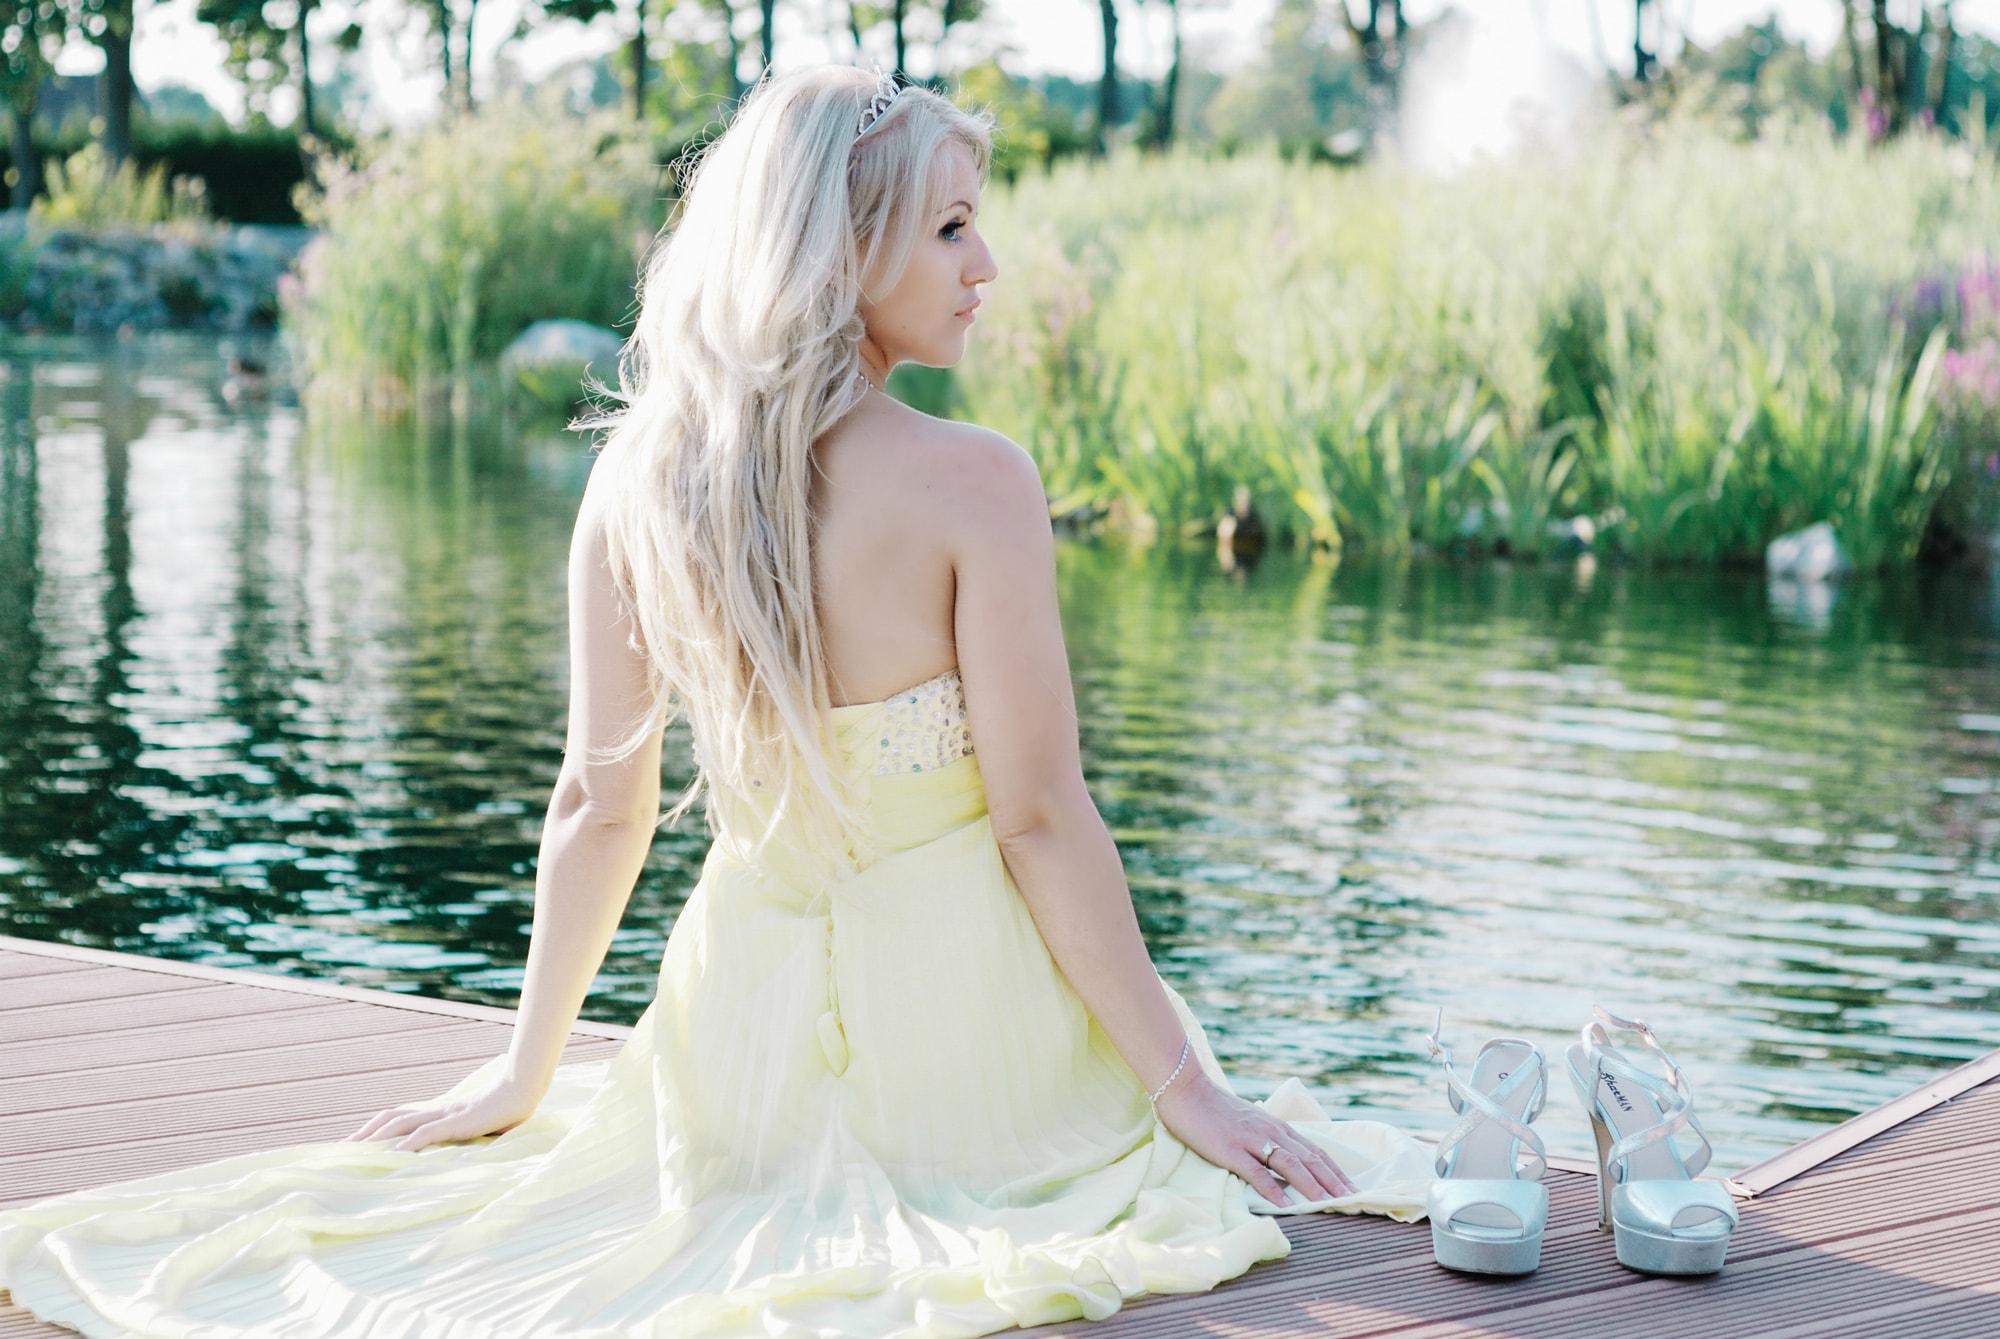 Девушка возле пруда - Фотограф Киев - Женя Лайт